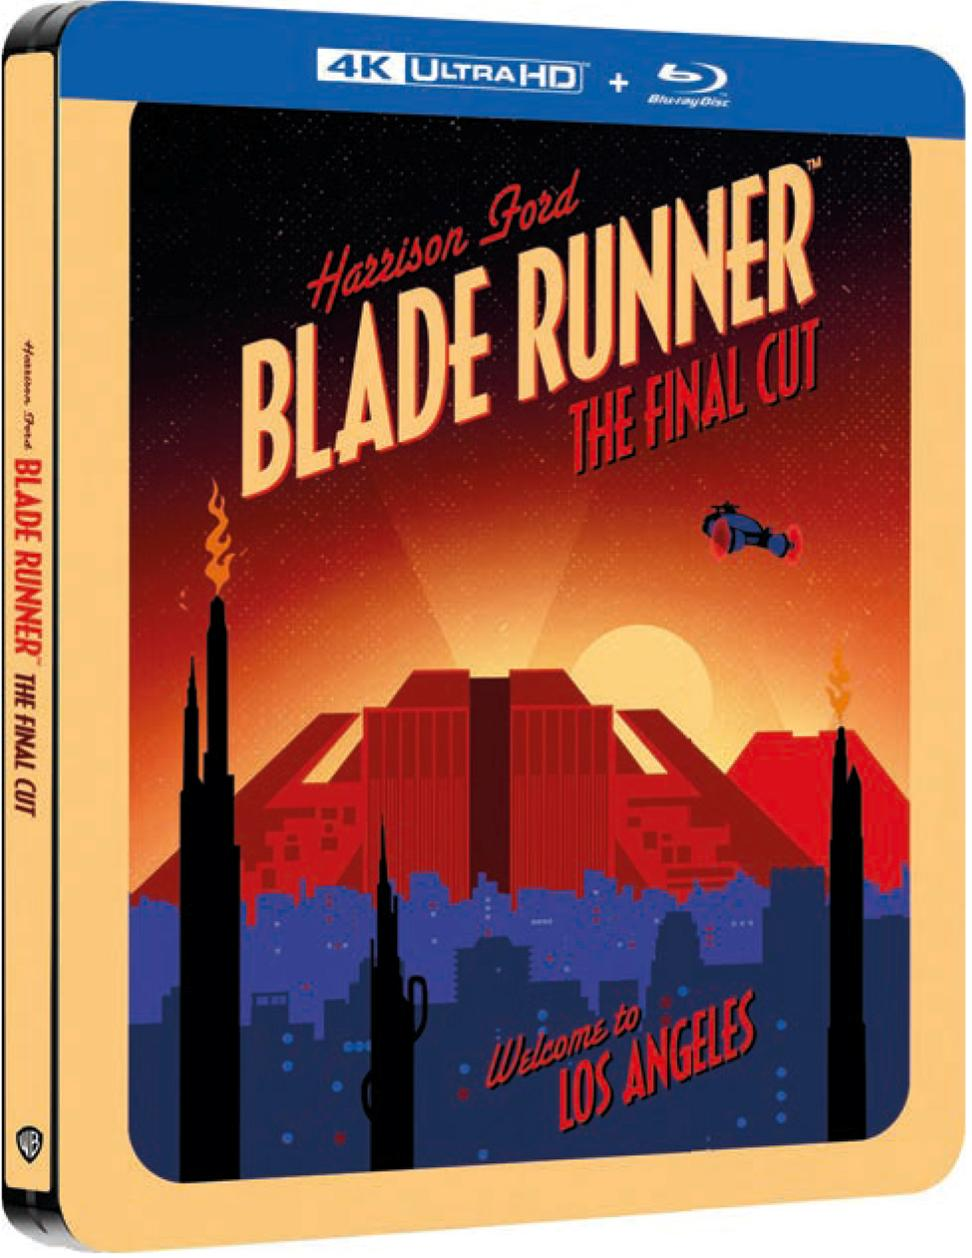 BLADE RUNNER - FINAL CUT (STEELBOOK) (4K ULTRA HD + BLU-RAY)